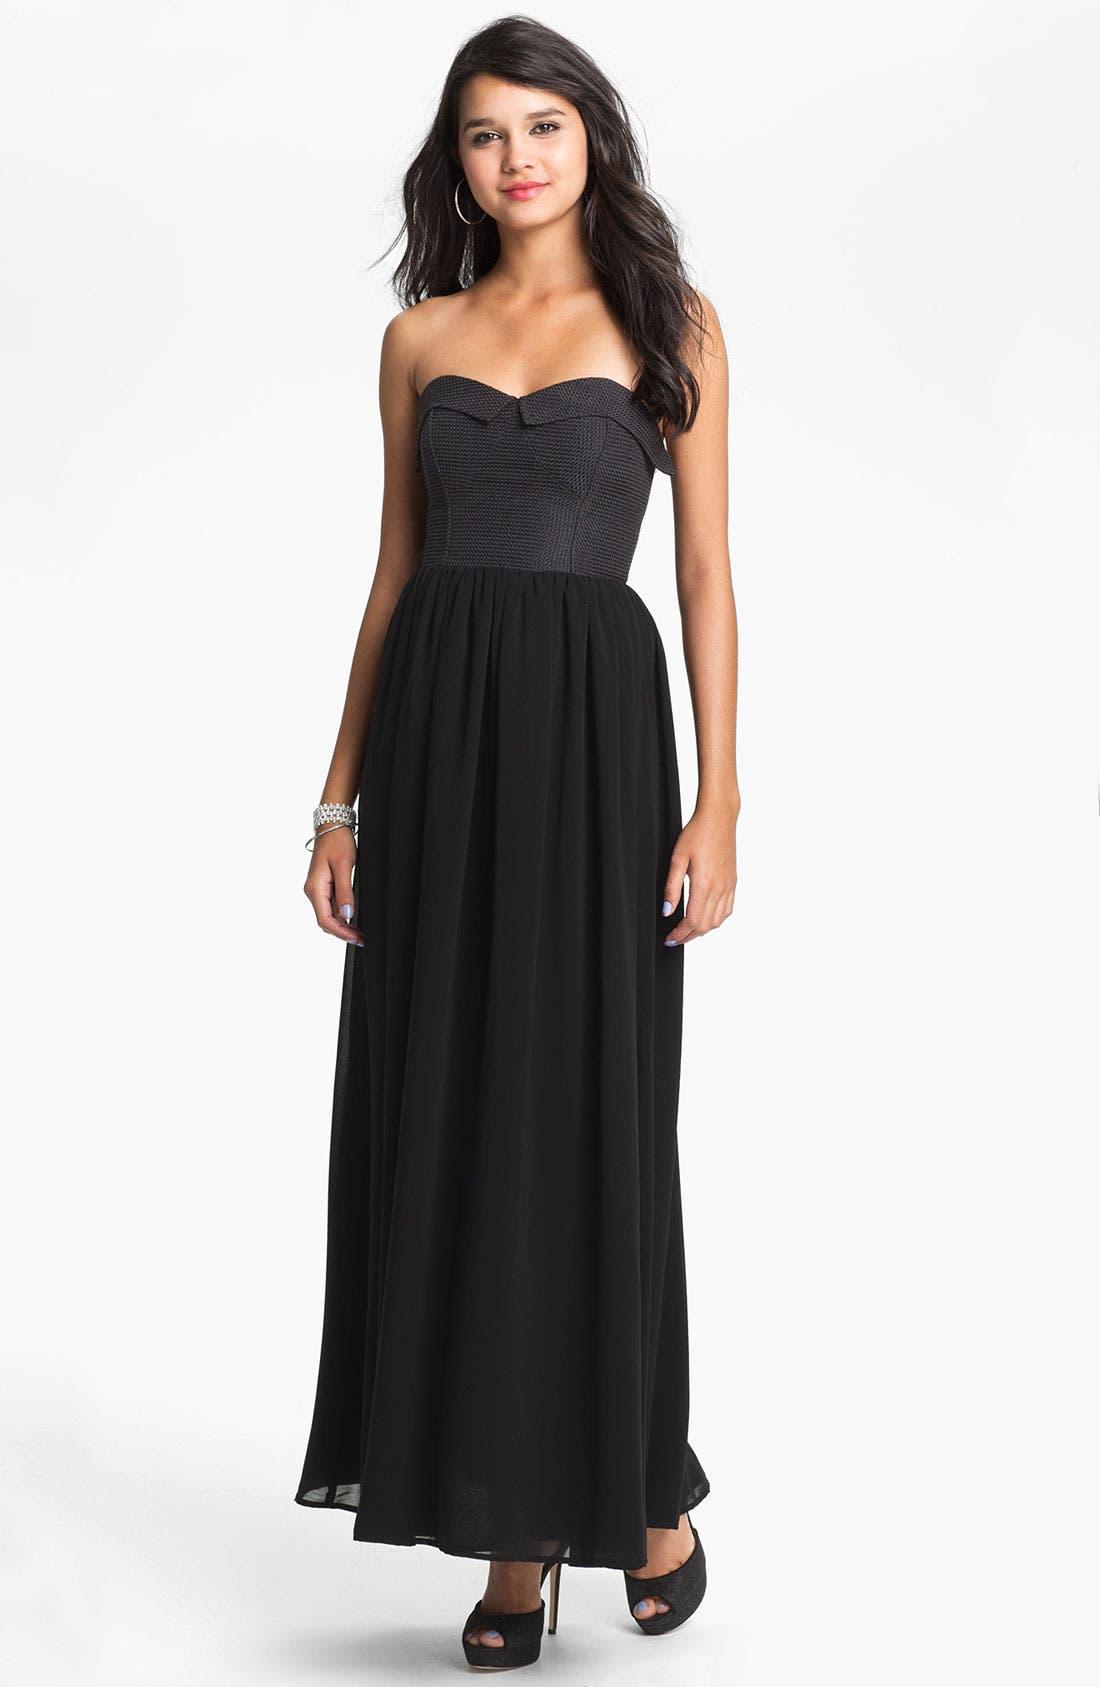 Main Image - Keepsake the Label 'To Be Free' Maxi Dress